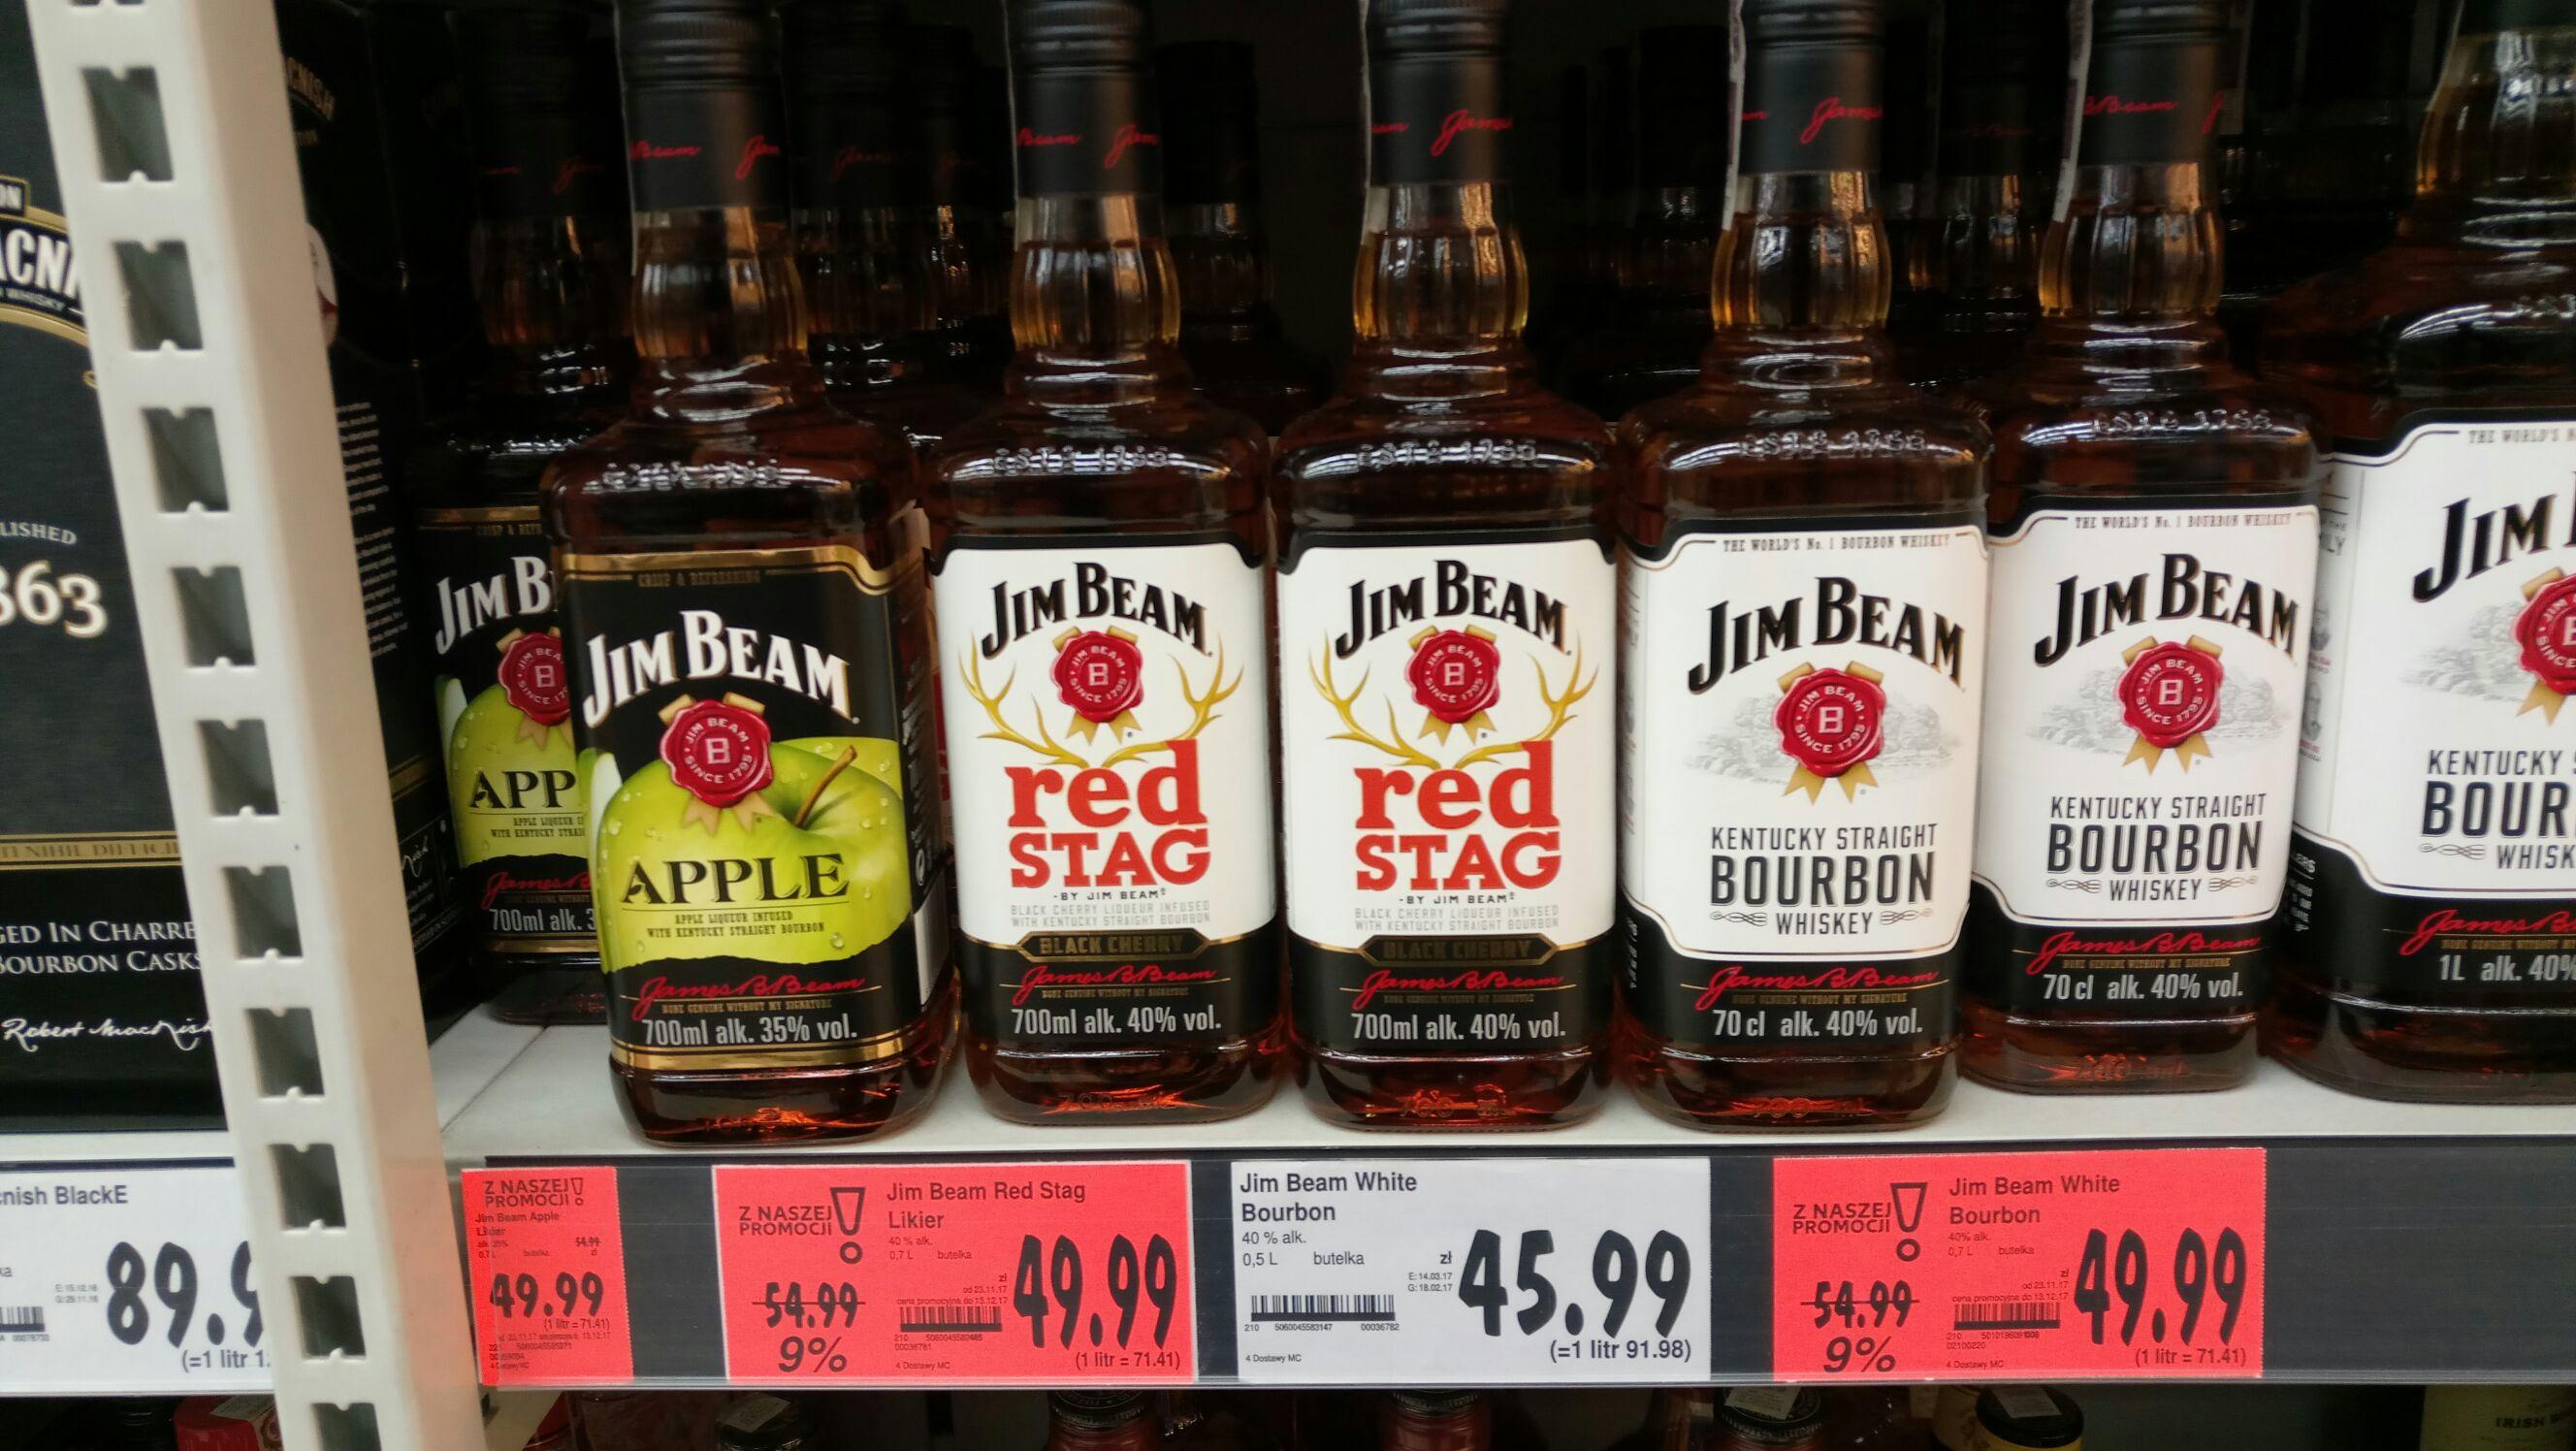 Jim Beam Bourbon, Red Stag, Apple 0,7l za 49,99 zł @ Kaufland